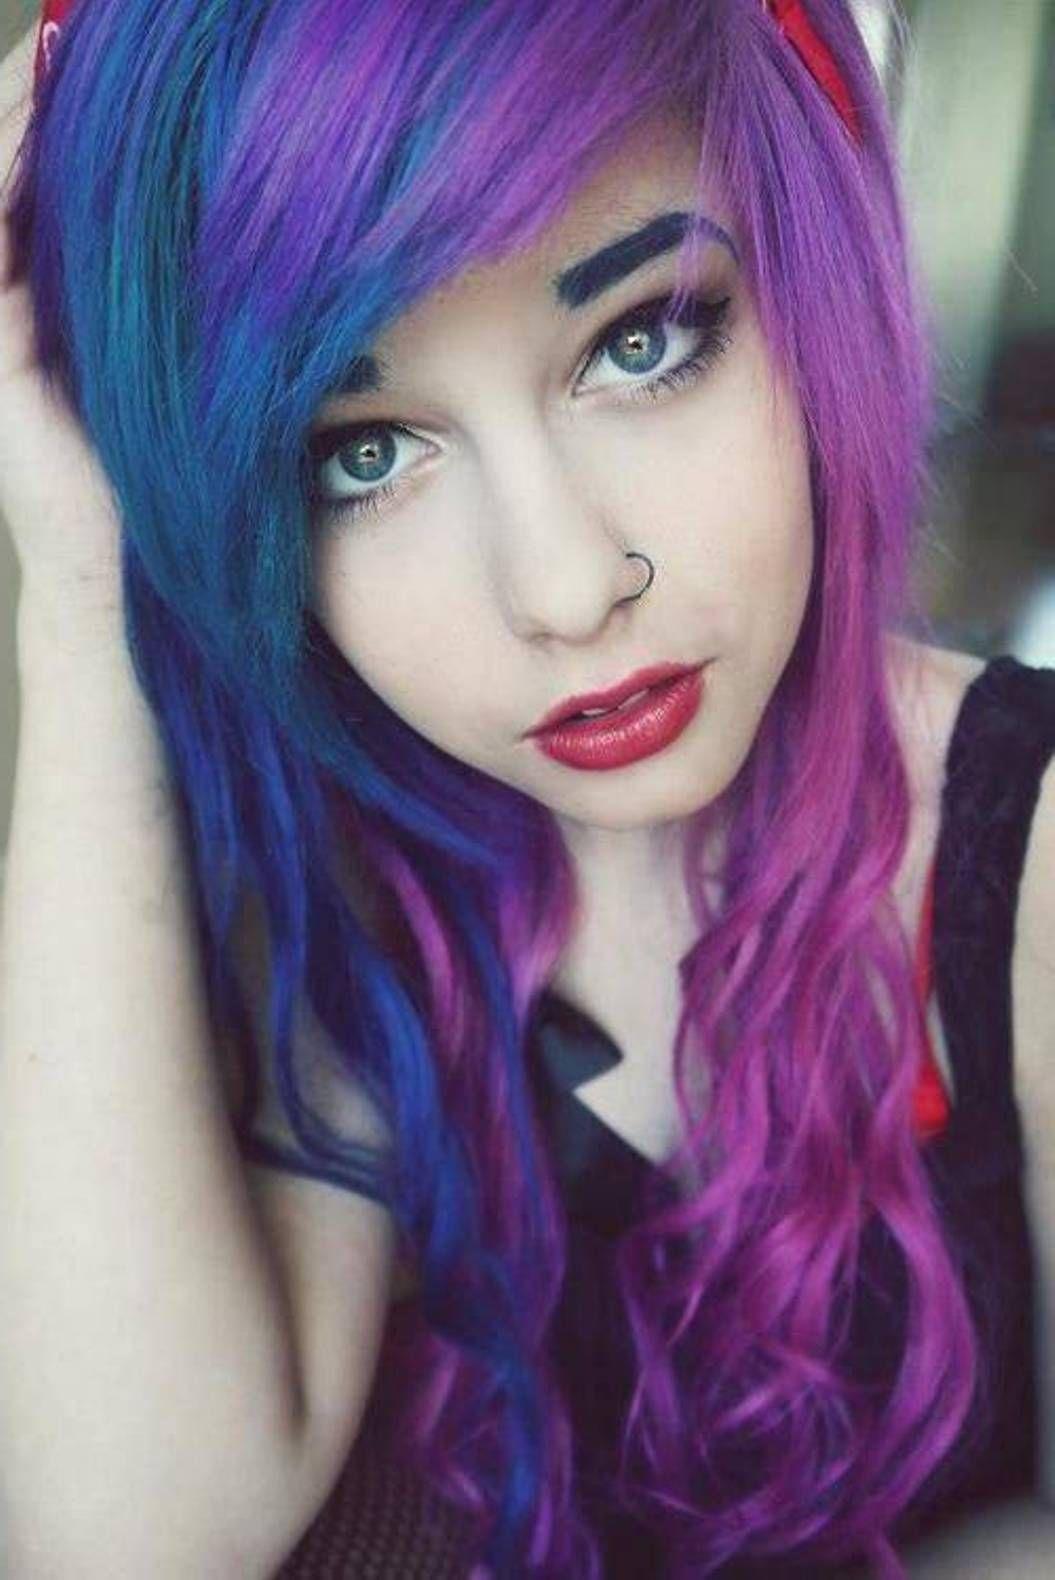 scene hair color ideas women style Celebrity plastic